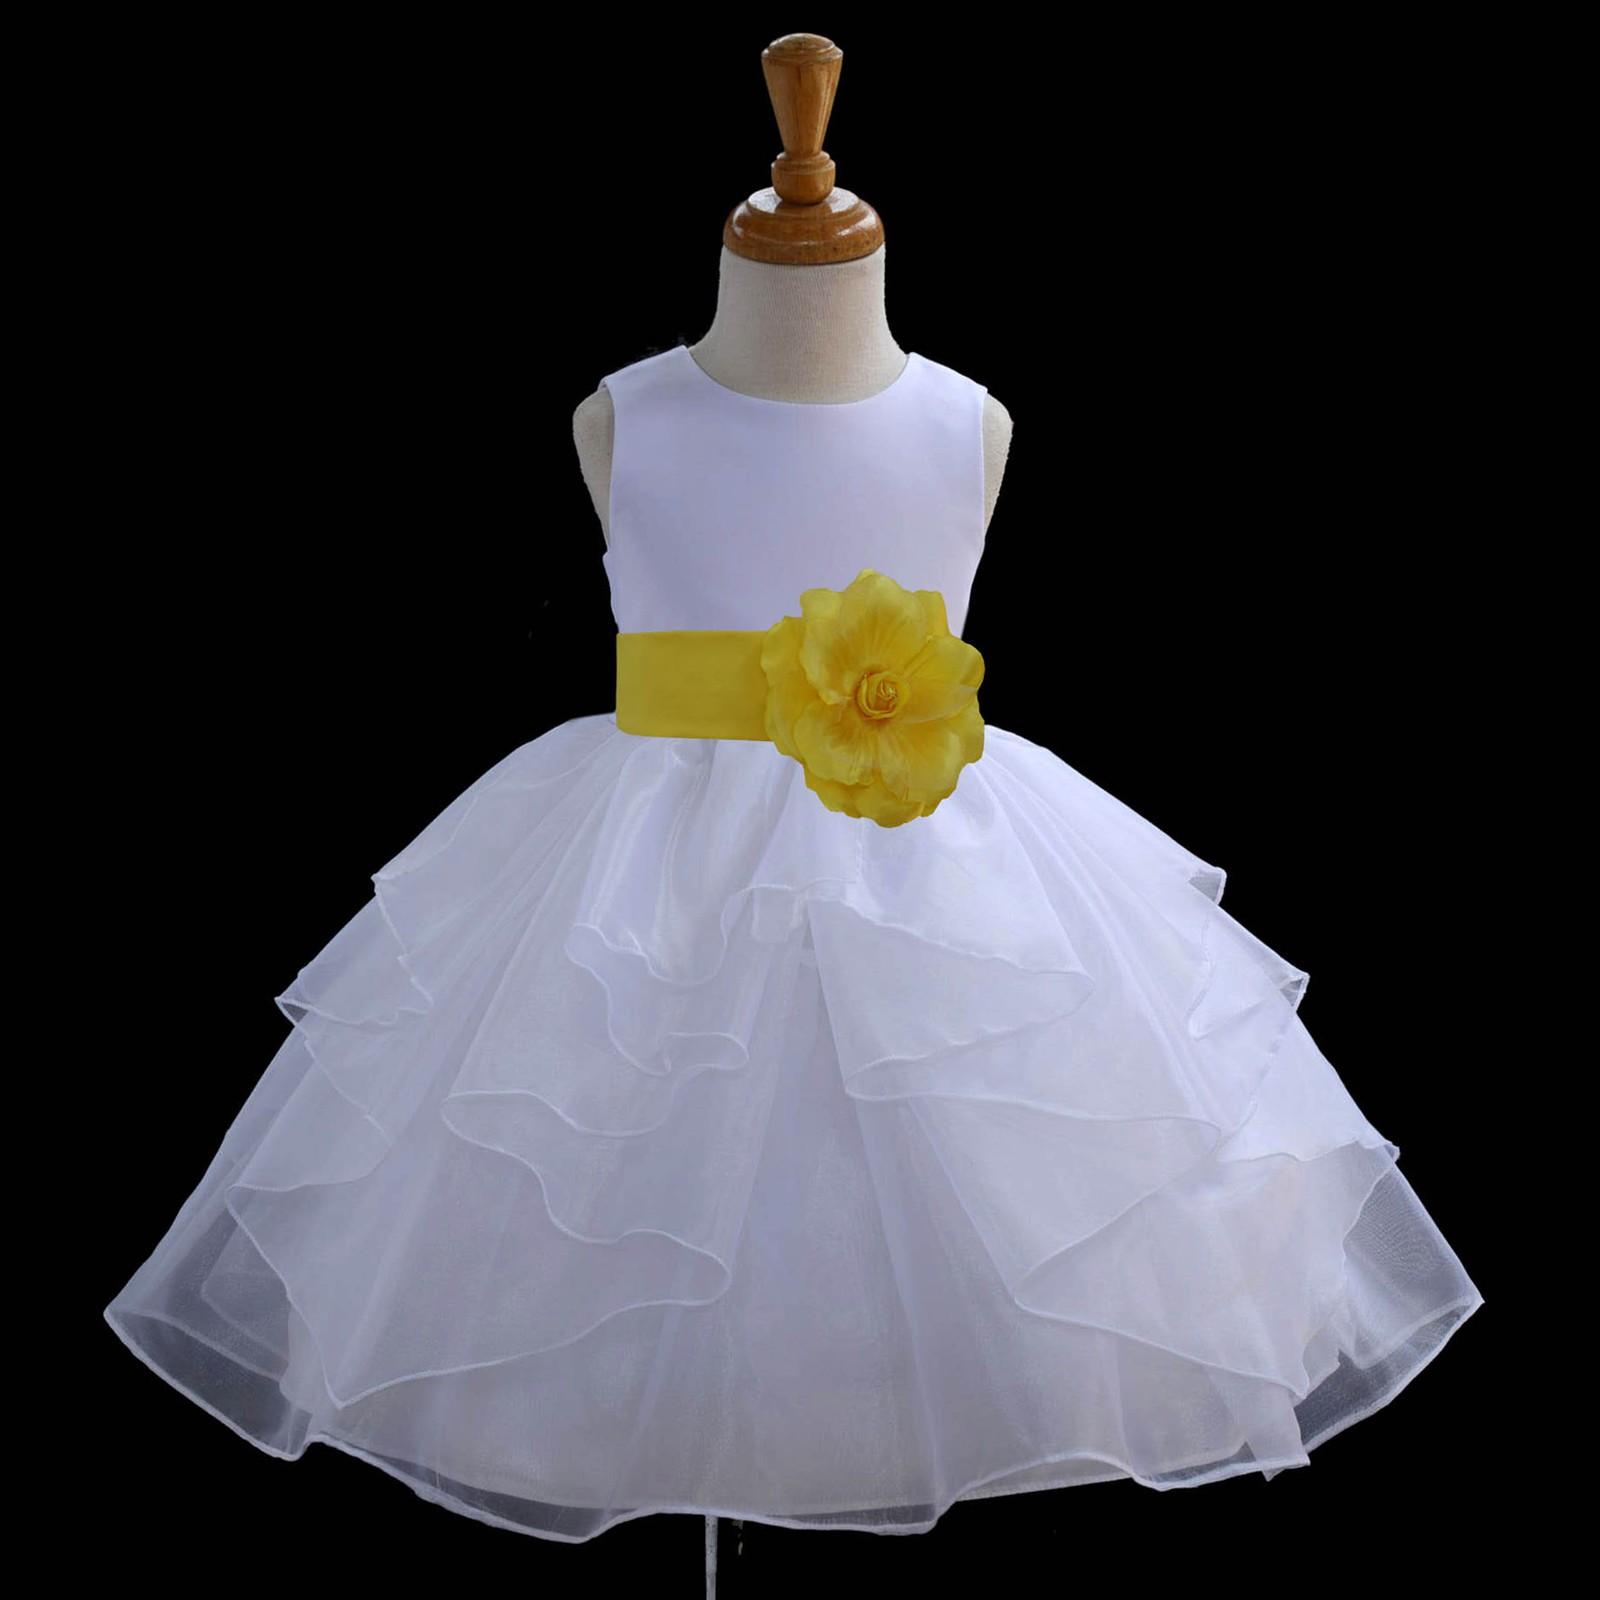 White/Sunbeam Satin Shimmering Organza Flower Girl Dress Wedding 4613S